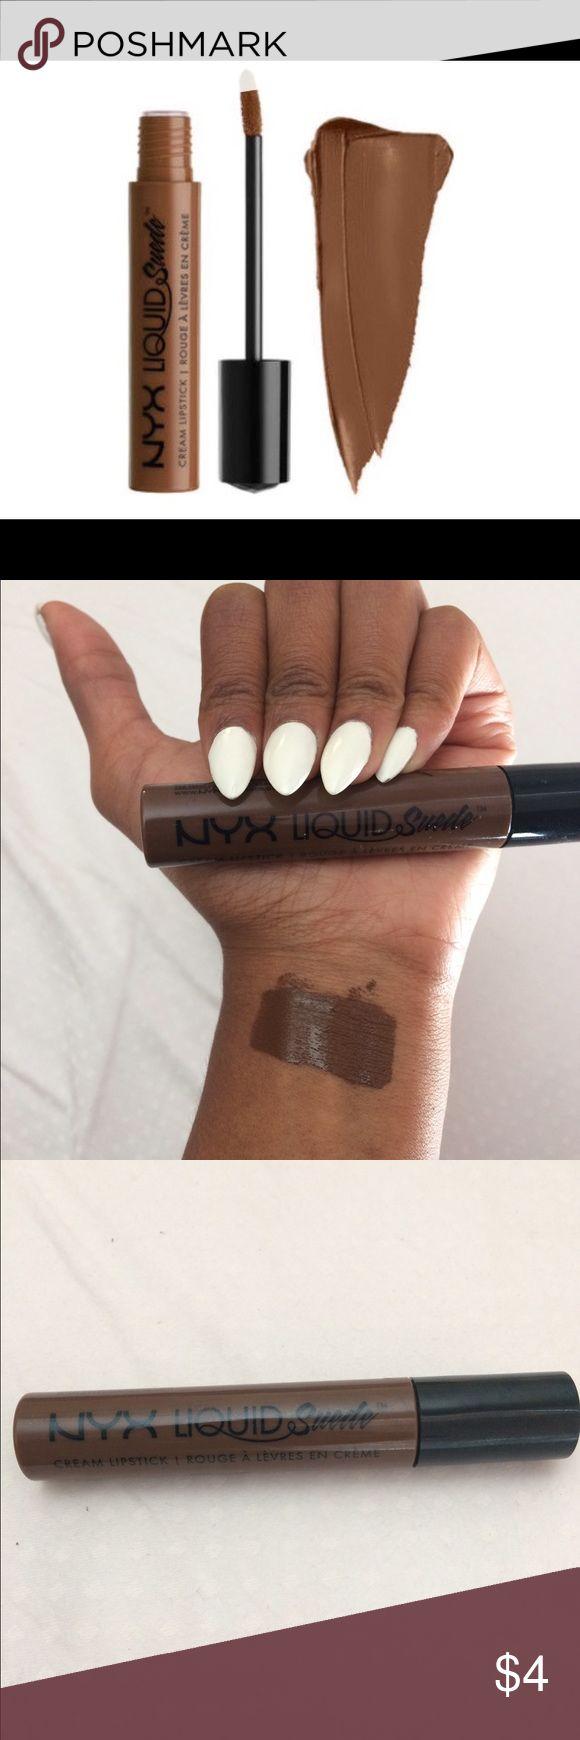 NYX Matte Lipstick - Sierra - Pink Lipstick - Matte Finish ...  Nyx Matte Lipstick Sierra Dark Skin